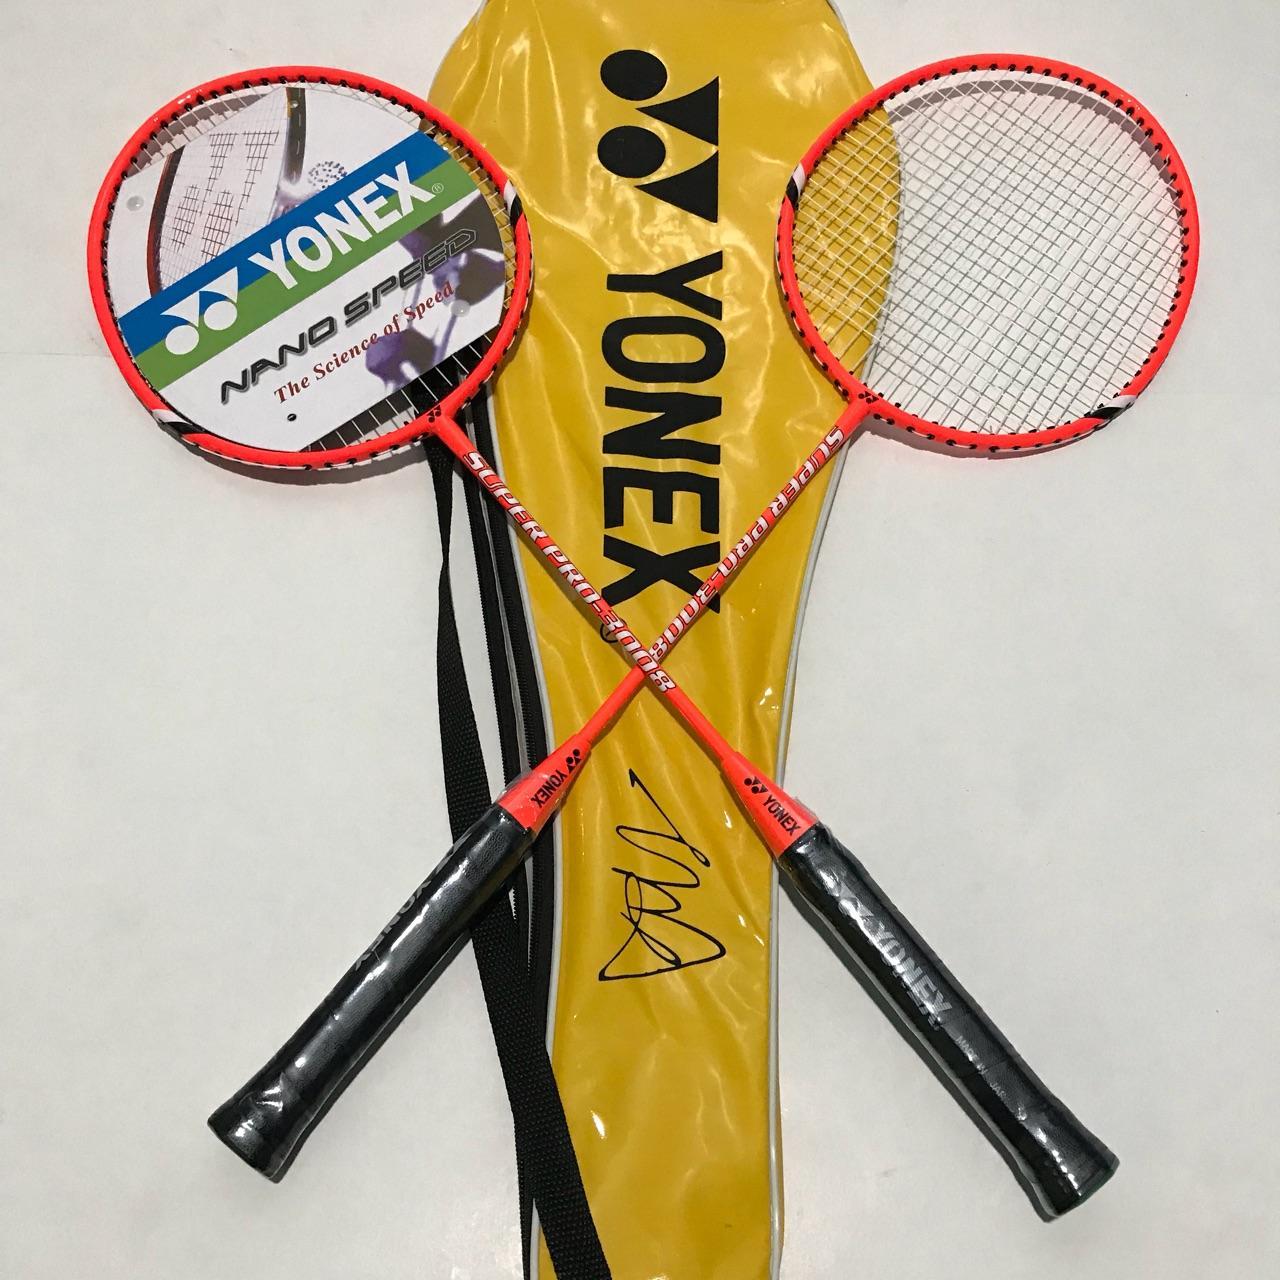 Yonex Badminton Racket Set of 2 with Bag PRO-3008